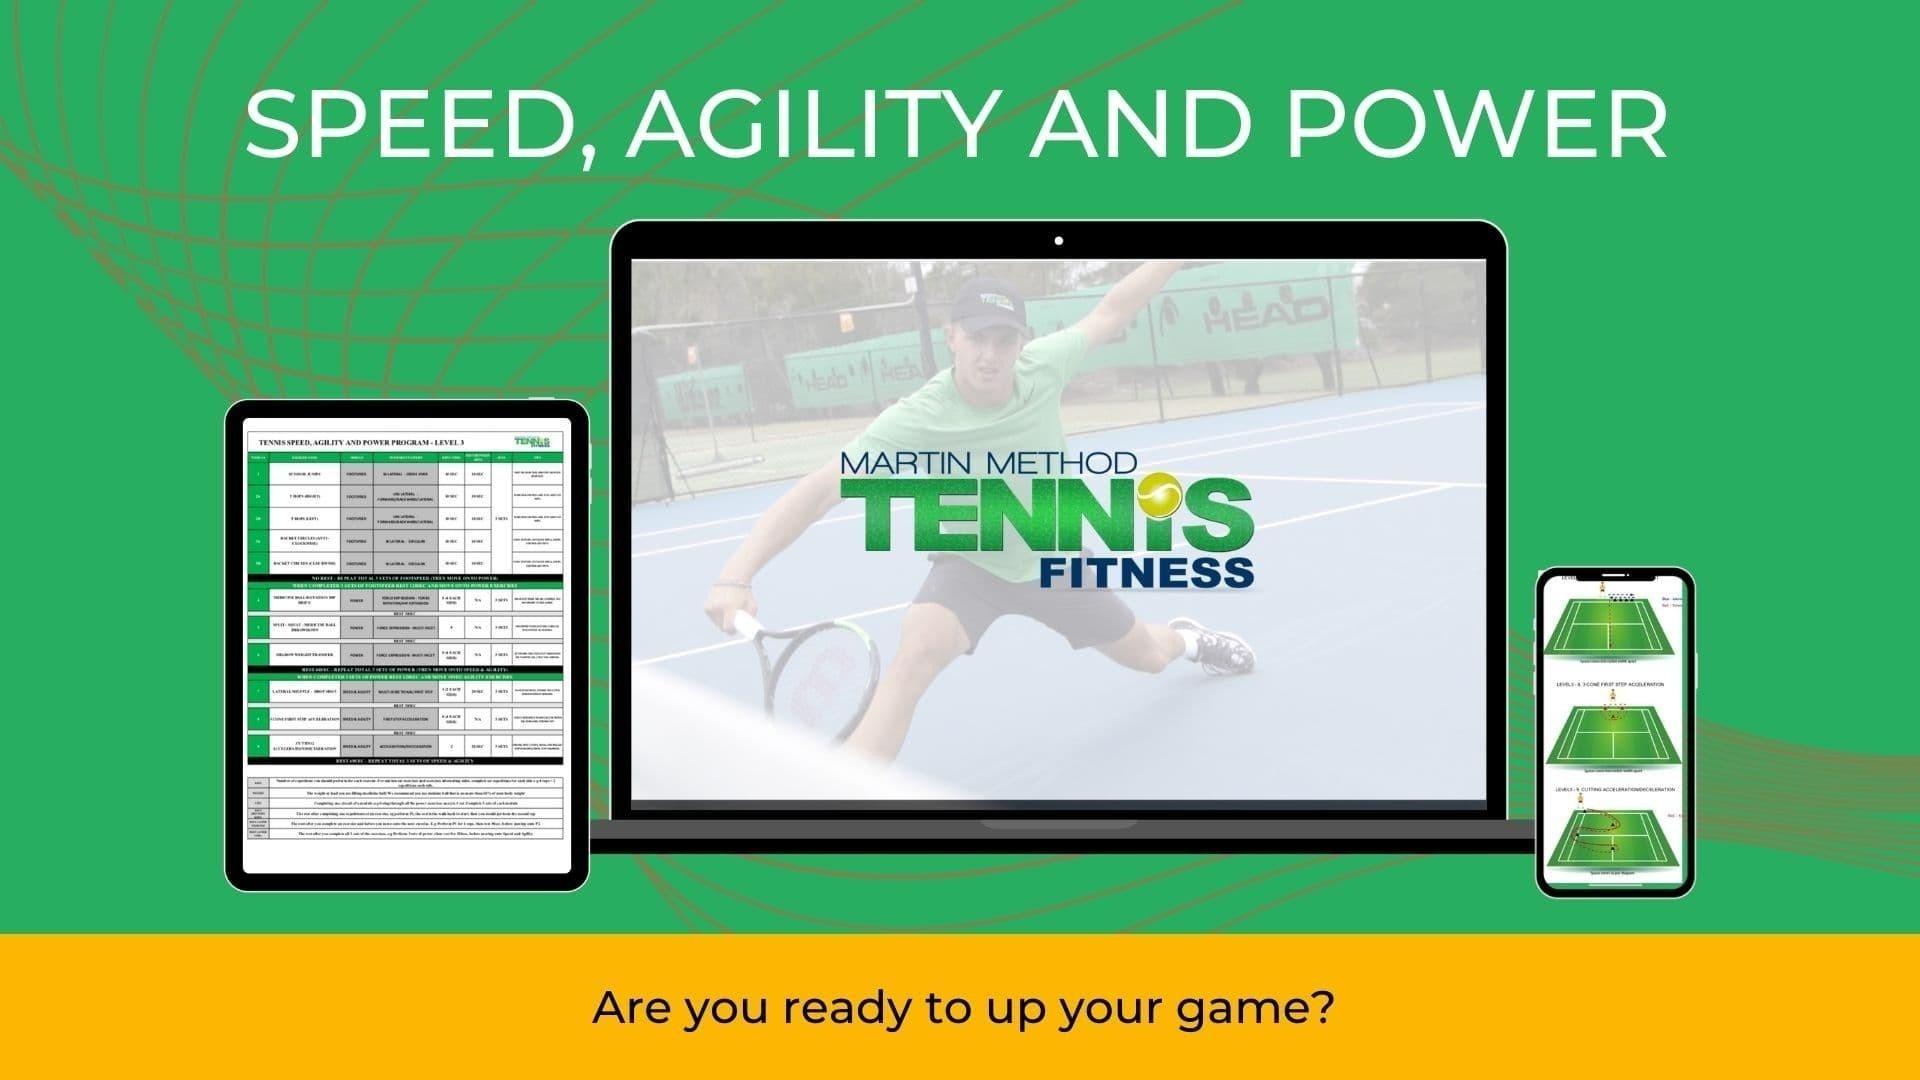 tennis-speed-agility-power-program